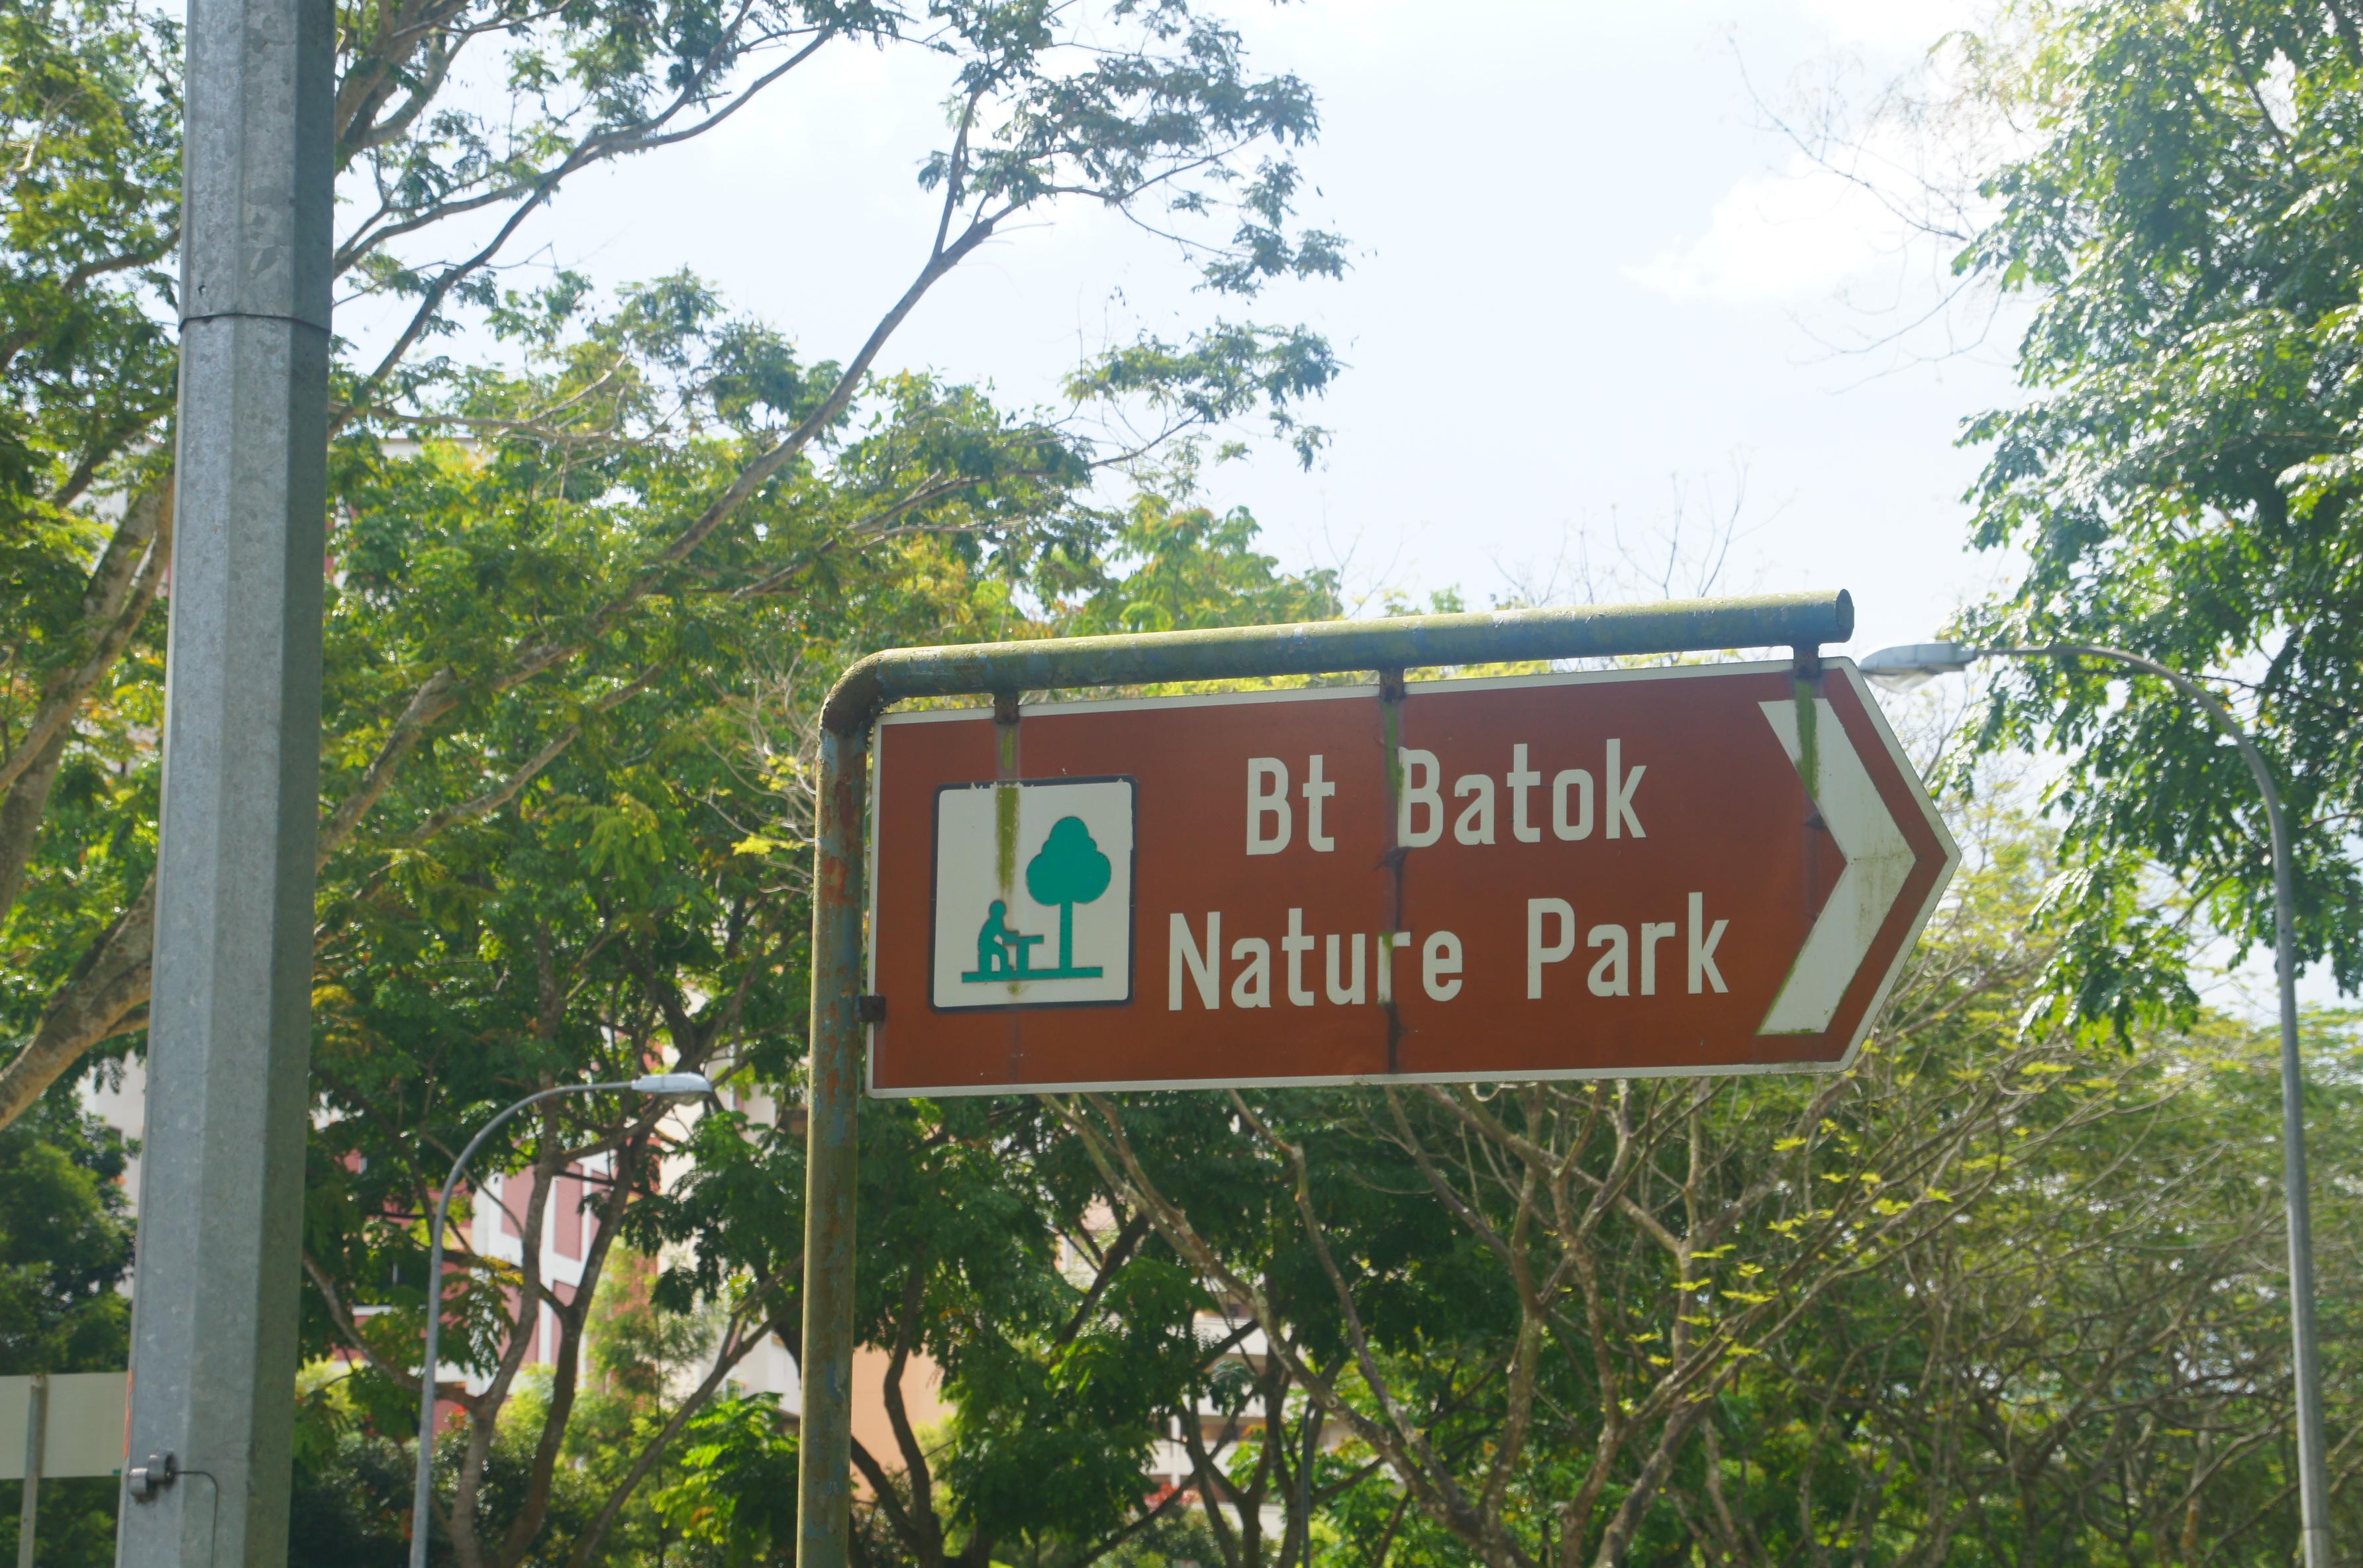 Bukit Batok Nature Park Mrt